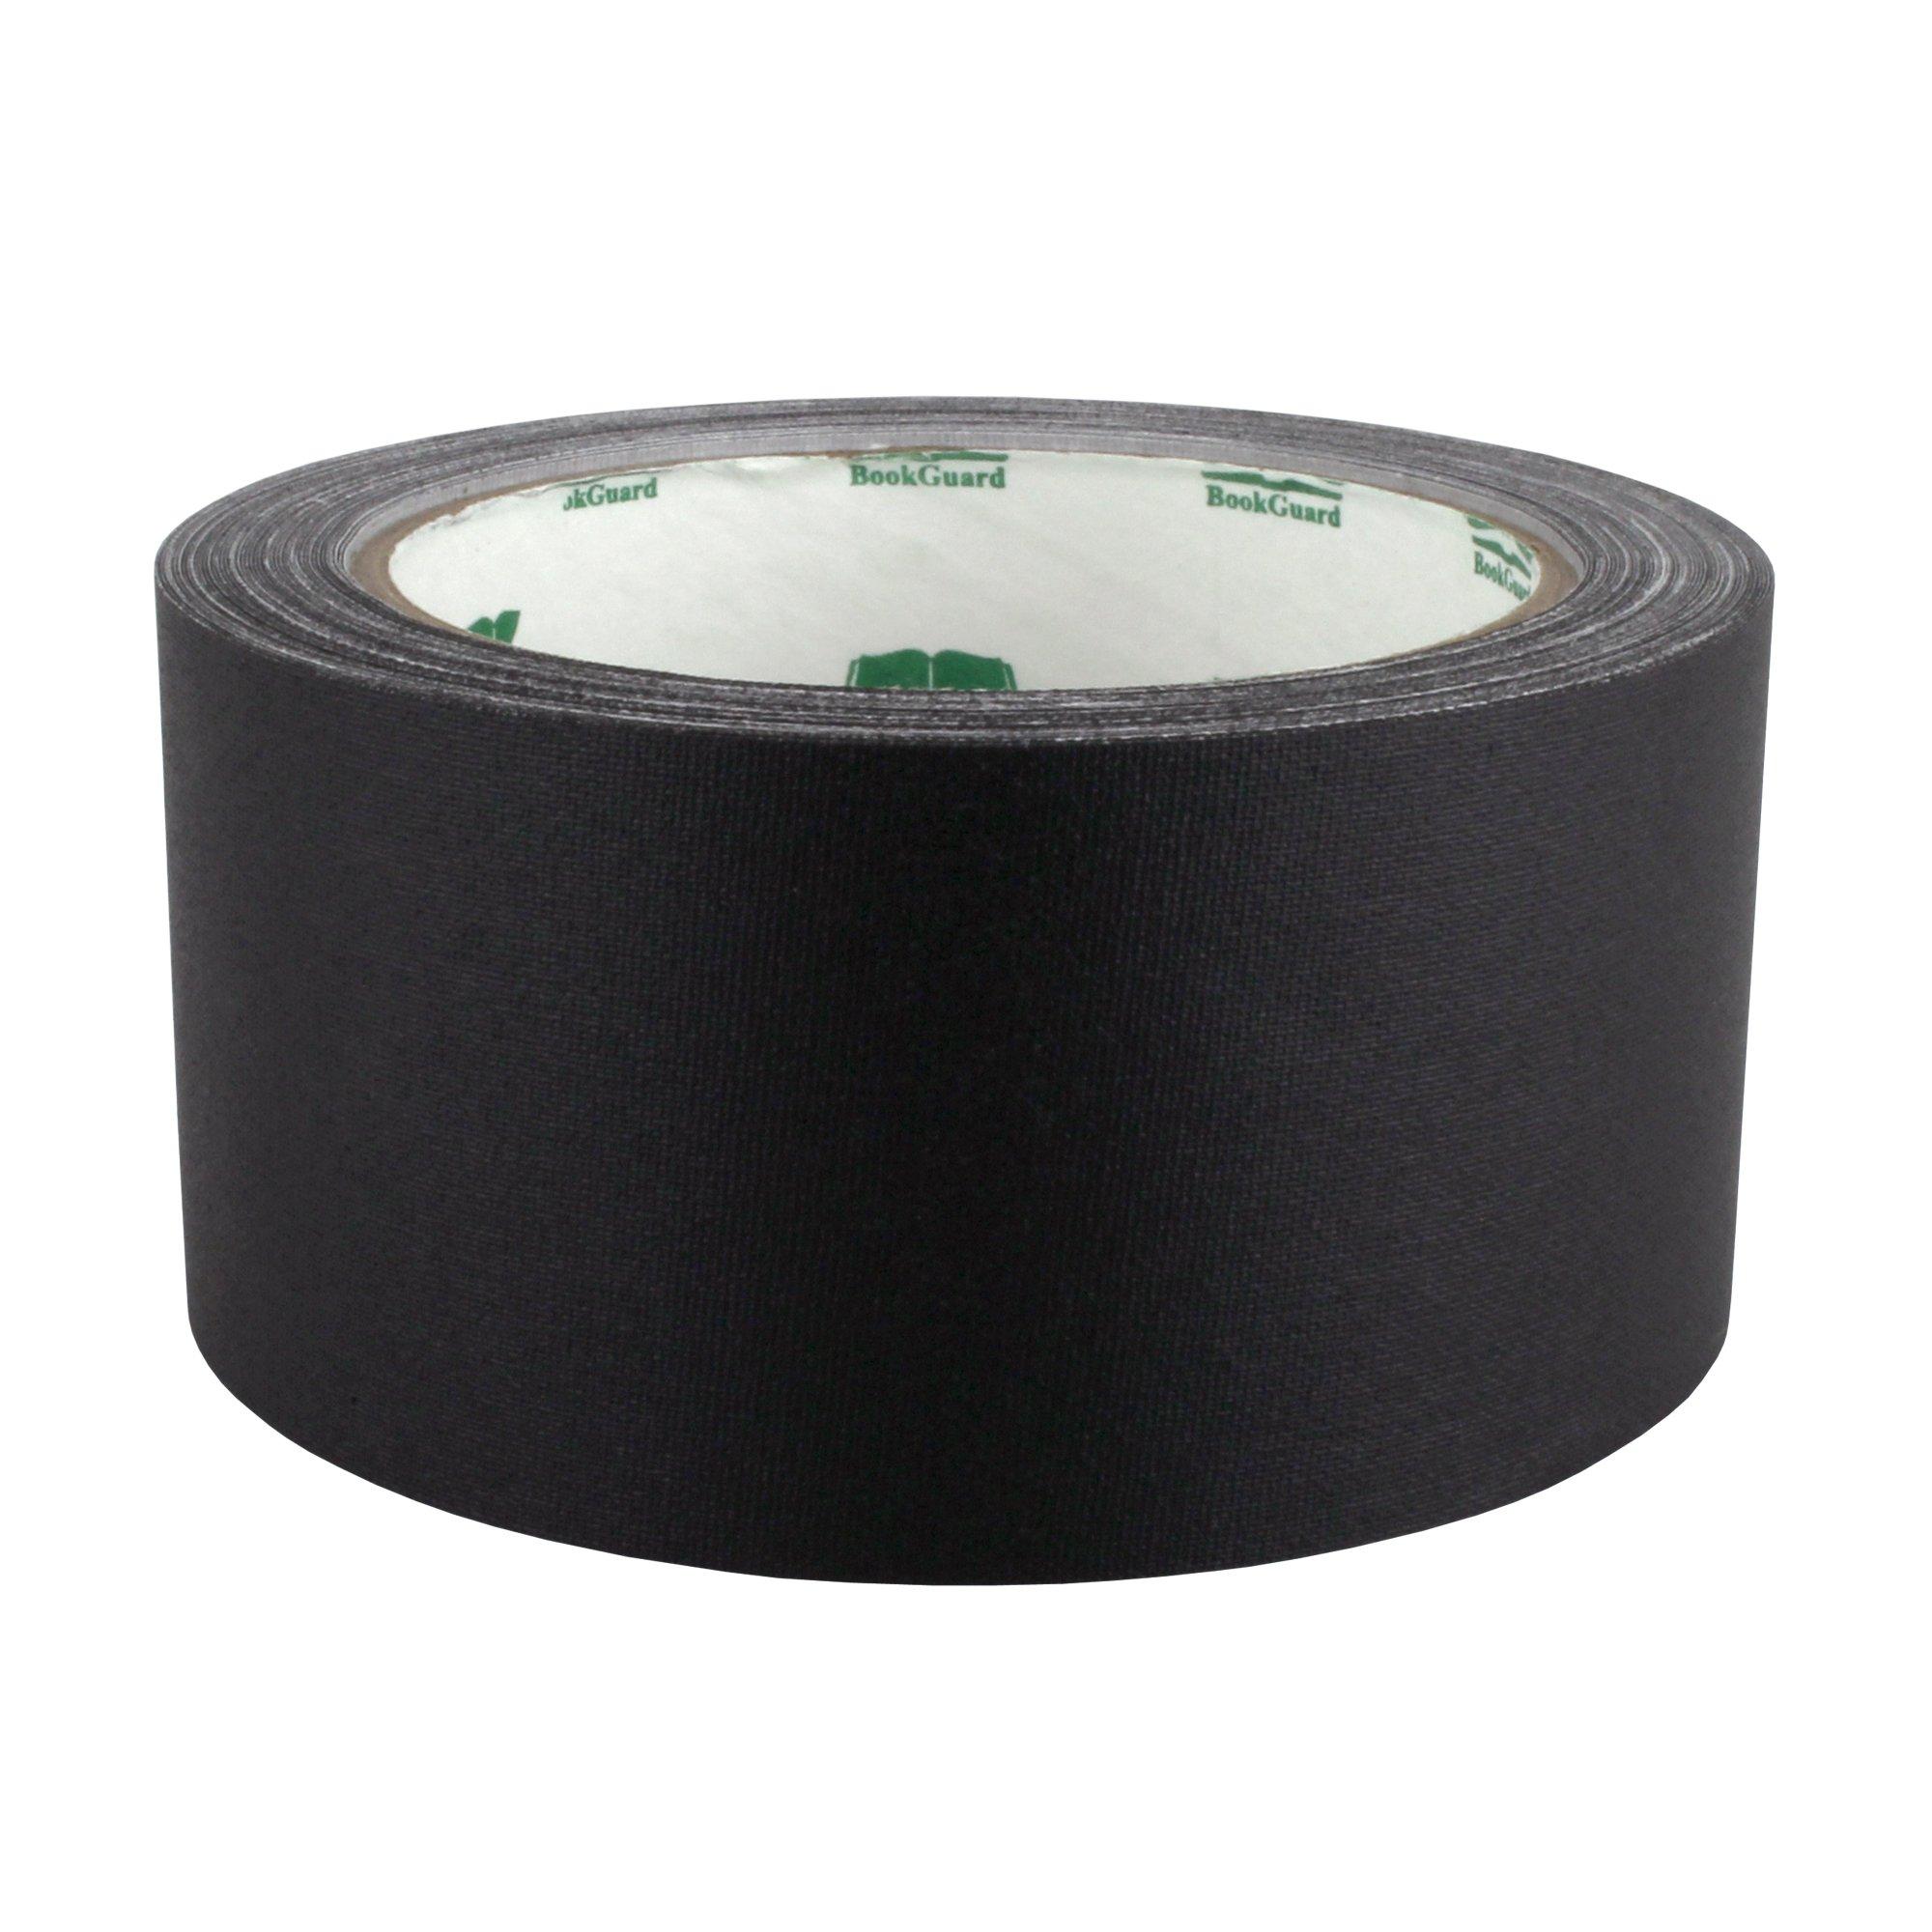 2'' Black Colored Premium-Cloth Book Binding Repair Tape | 15 Yard Roll (BookGuard Brand)